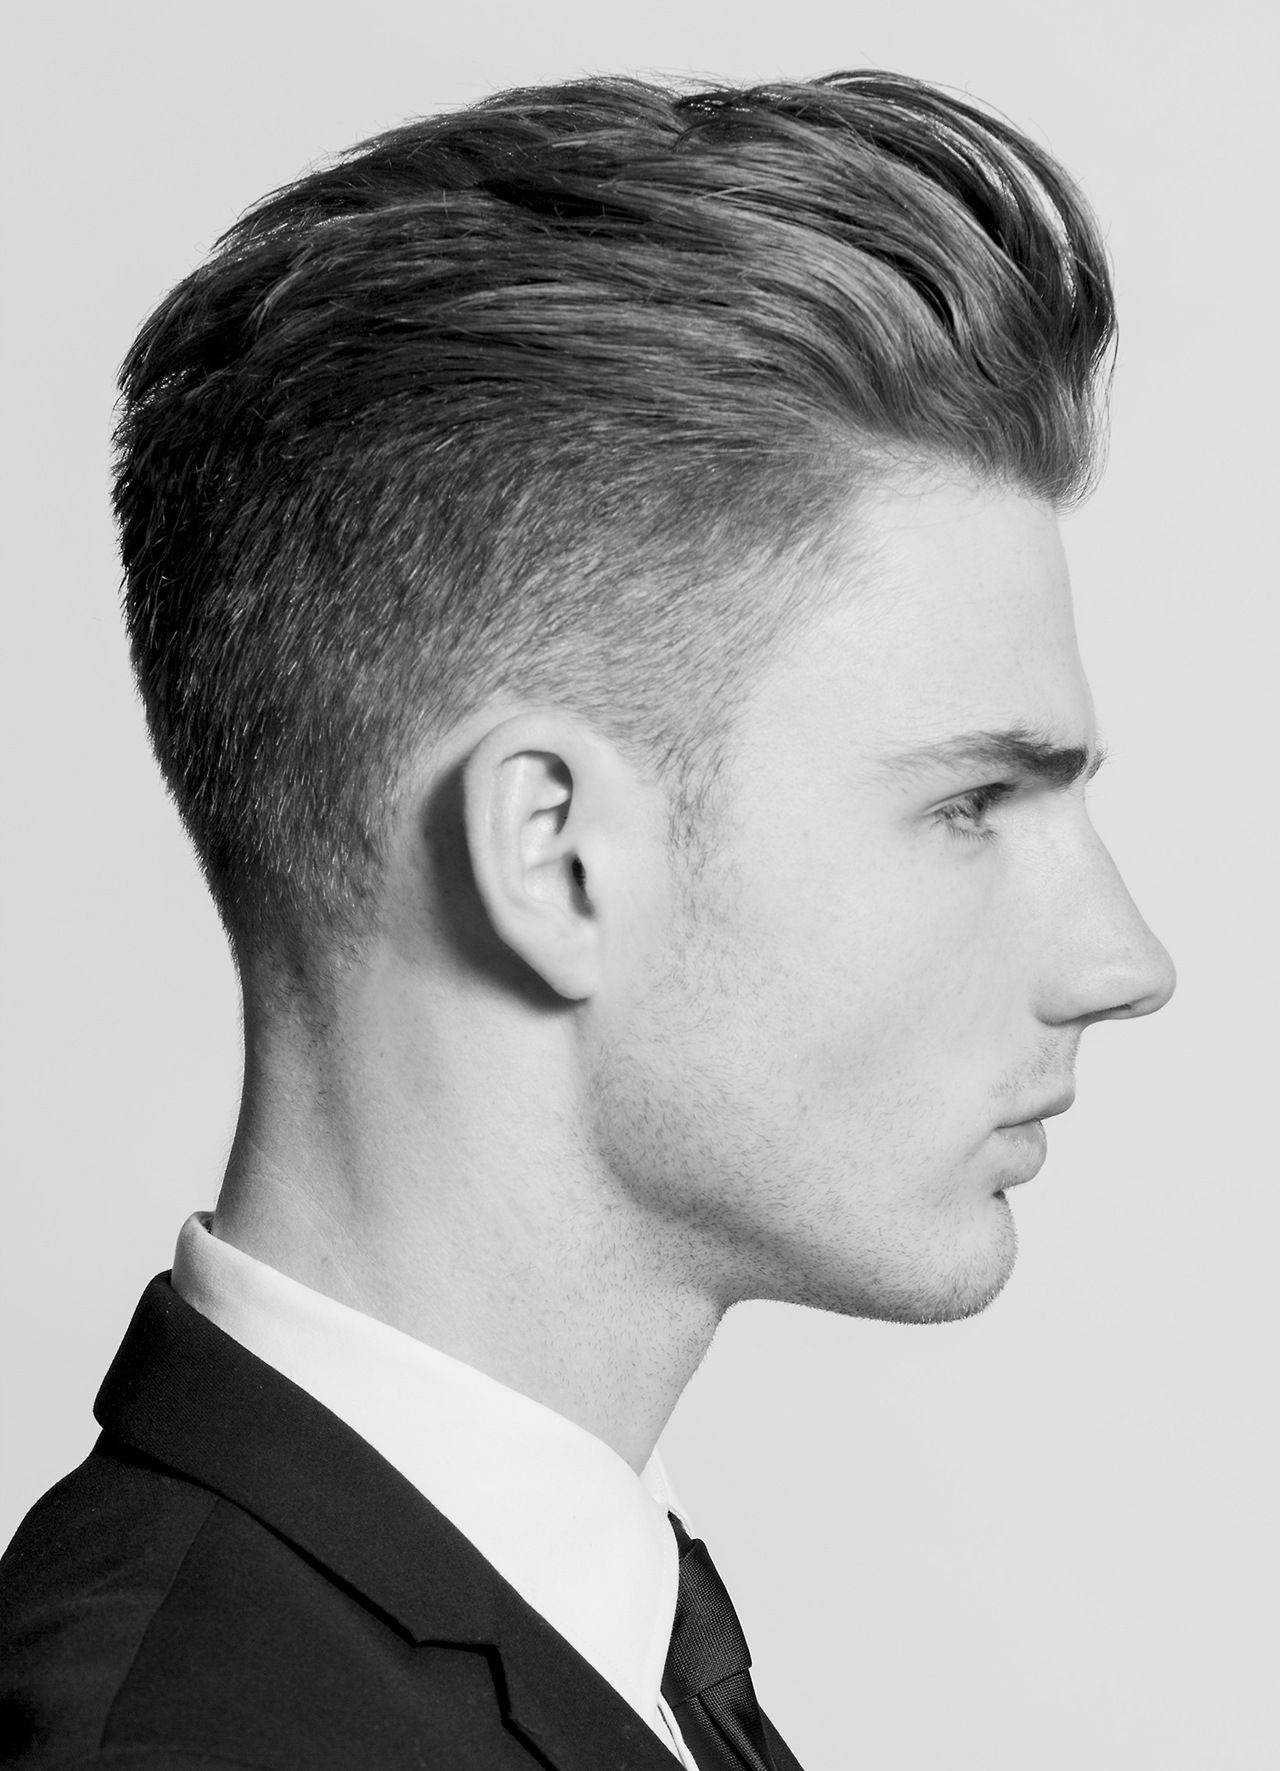 Best Short Haircuts For Men 2015 Pinterest